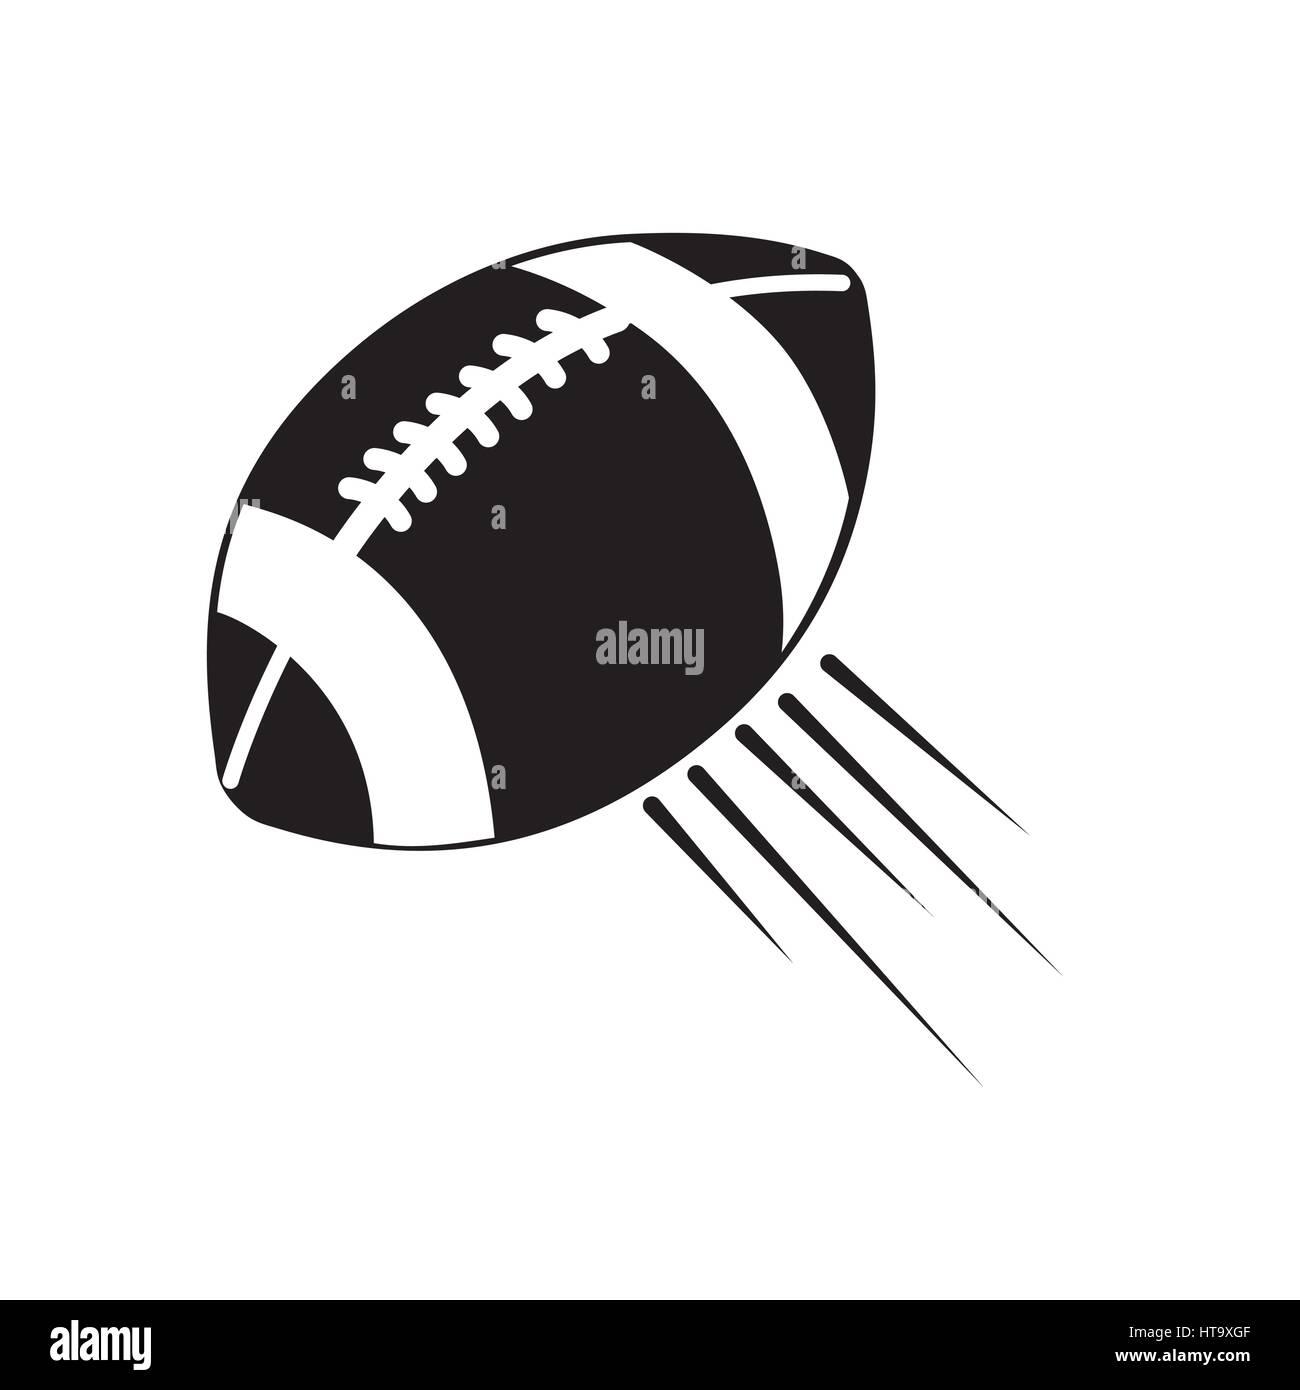 Kontur american Football und seine Kugel-Symbol Stock Vektor